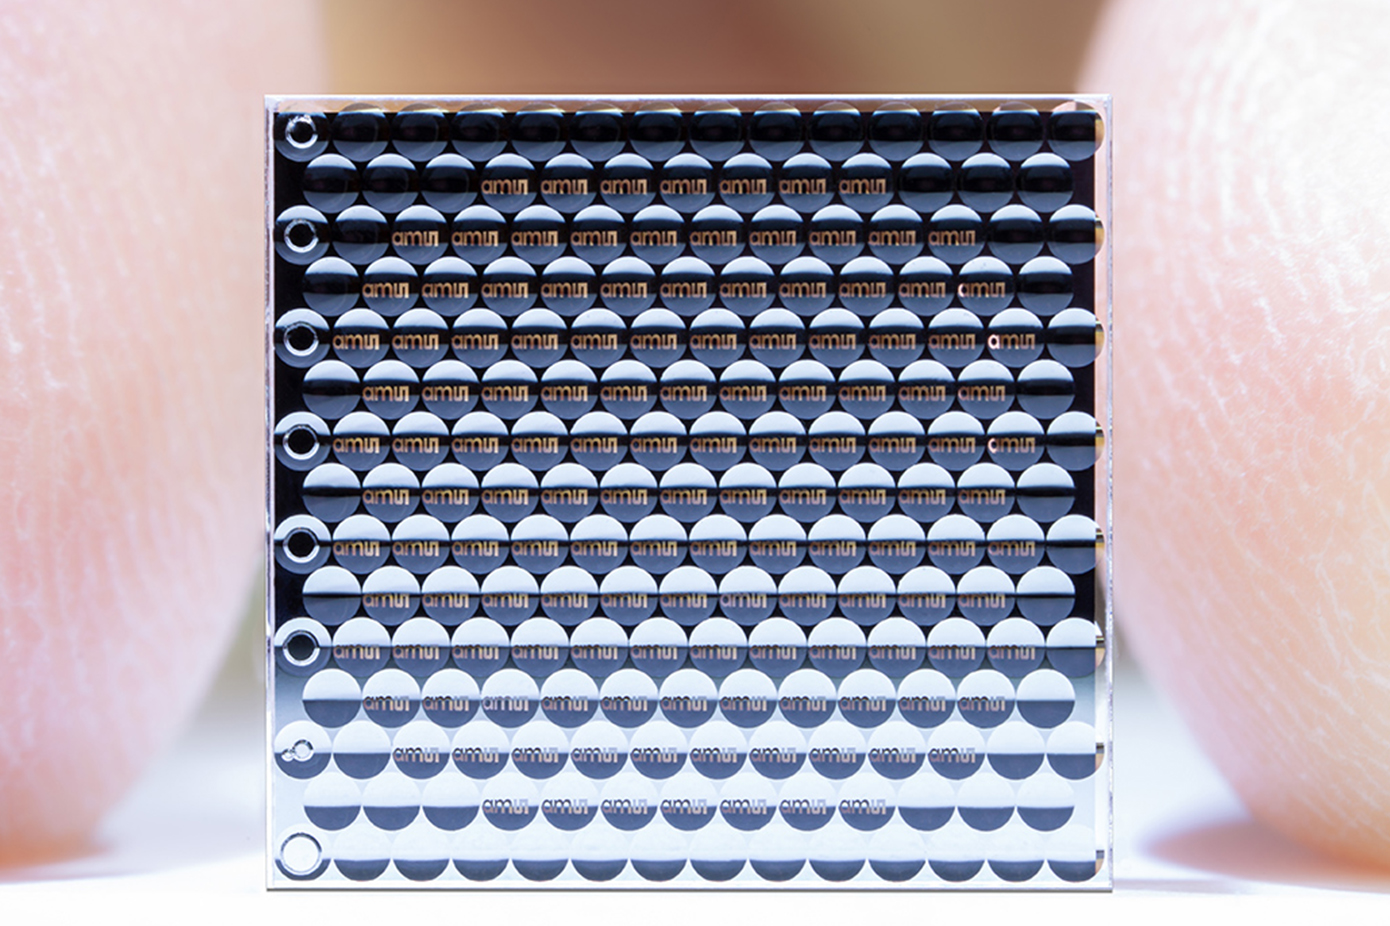 micro-lens array technology